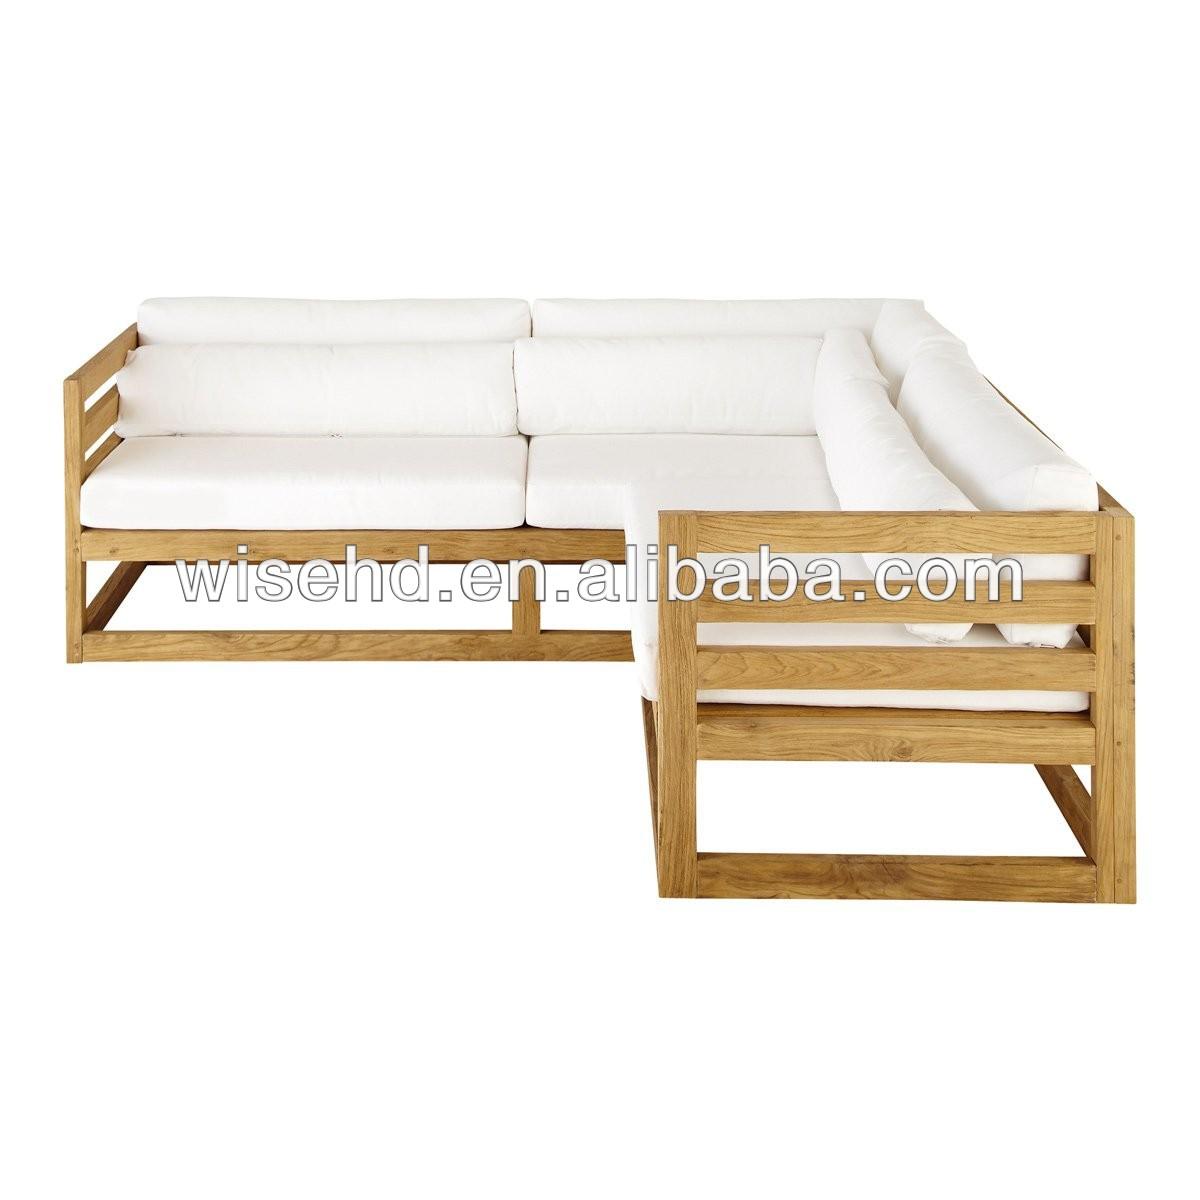 Folding Solid Wood Frame Sofa Bed For Living Room Furniture WJZ-B75